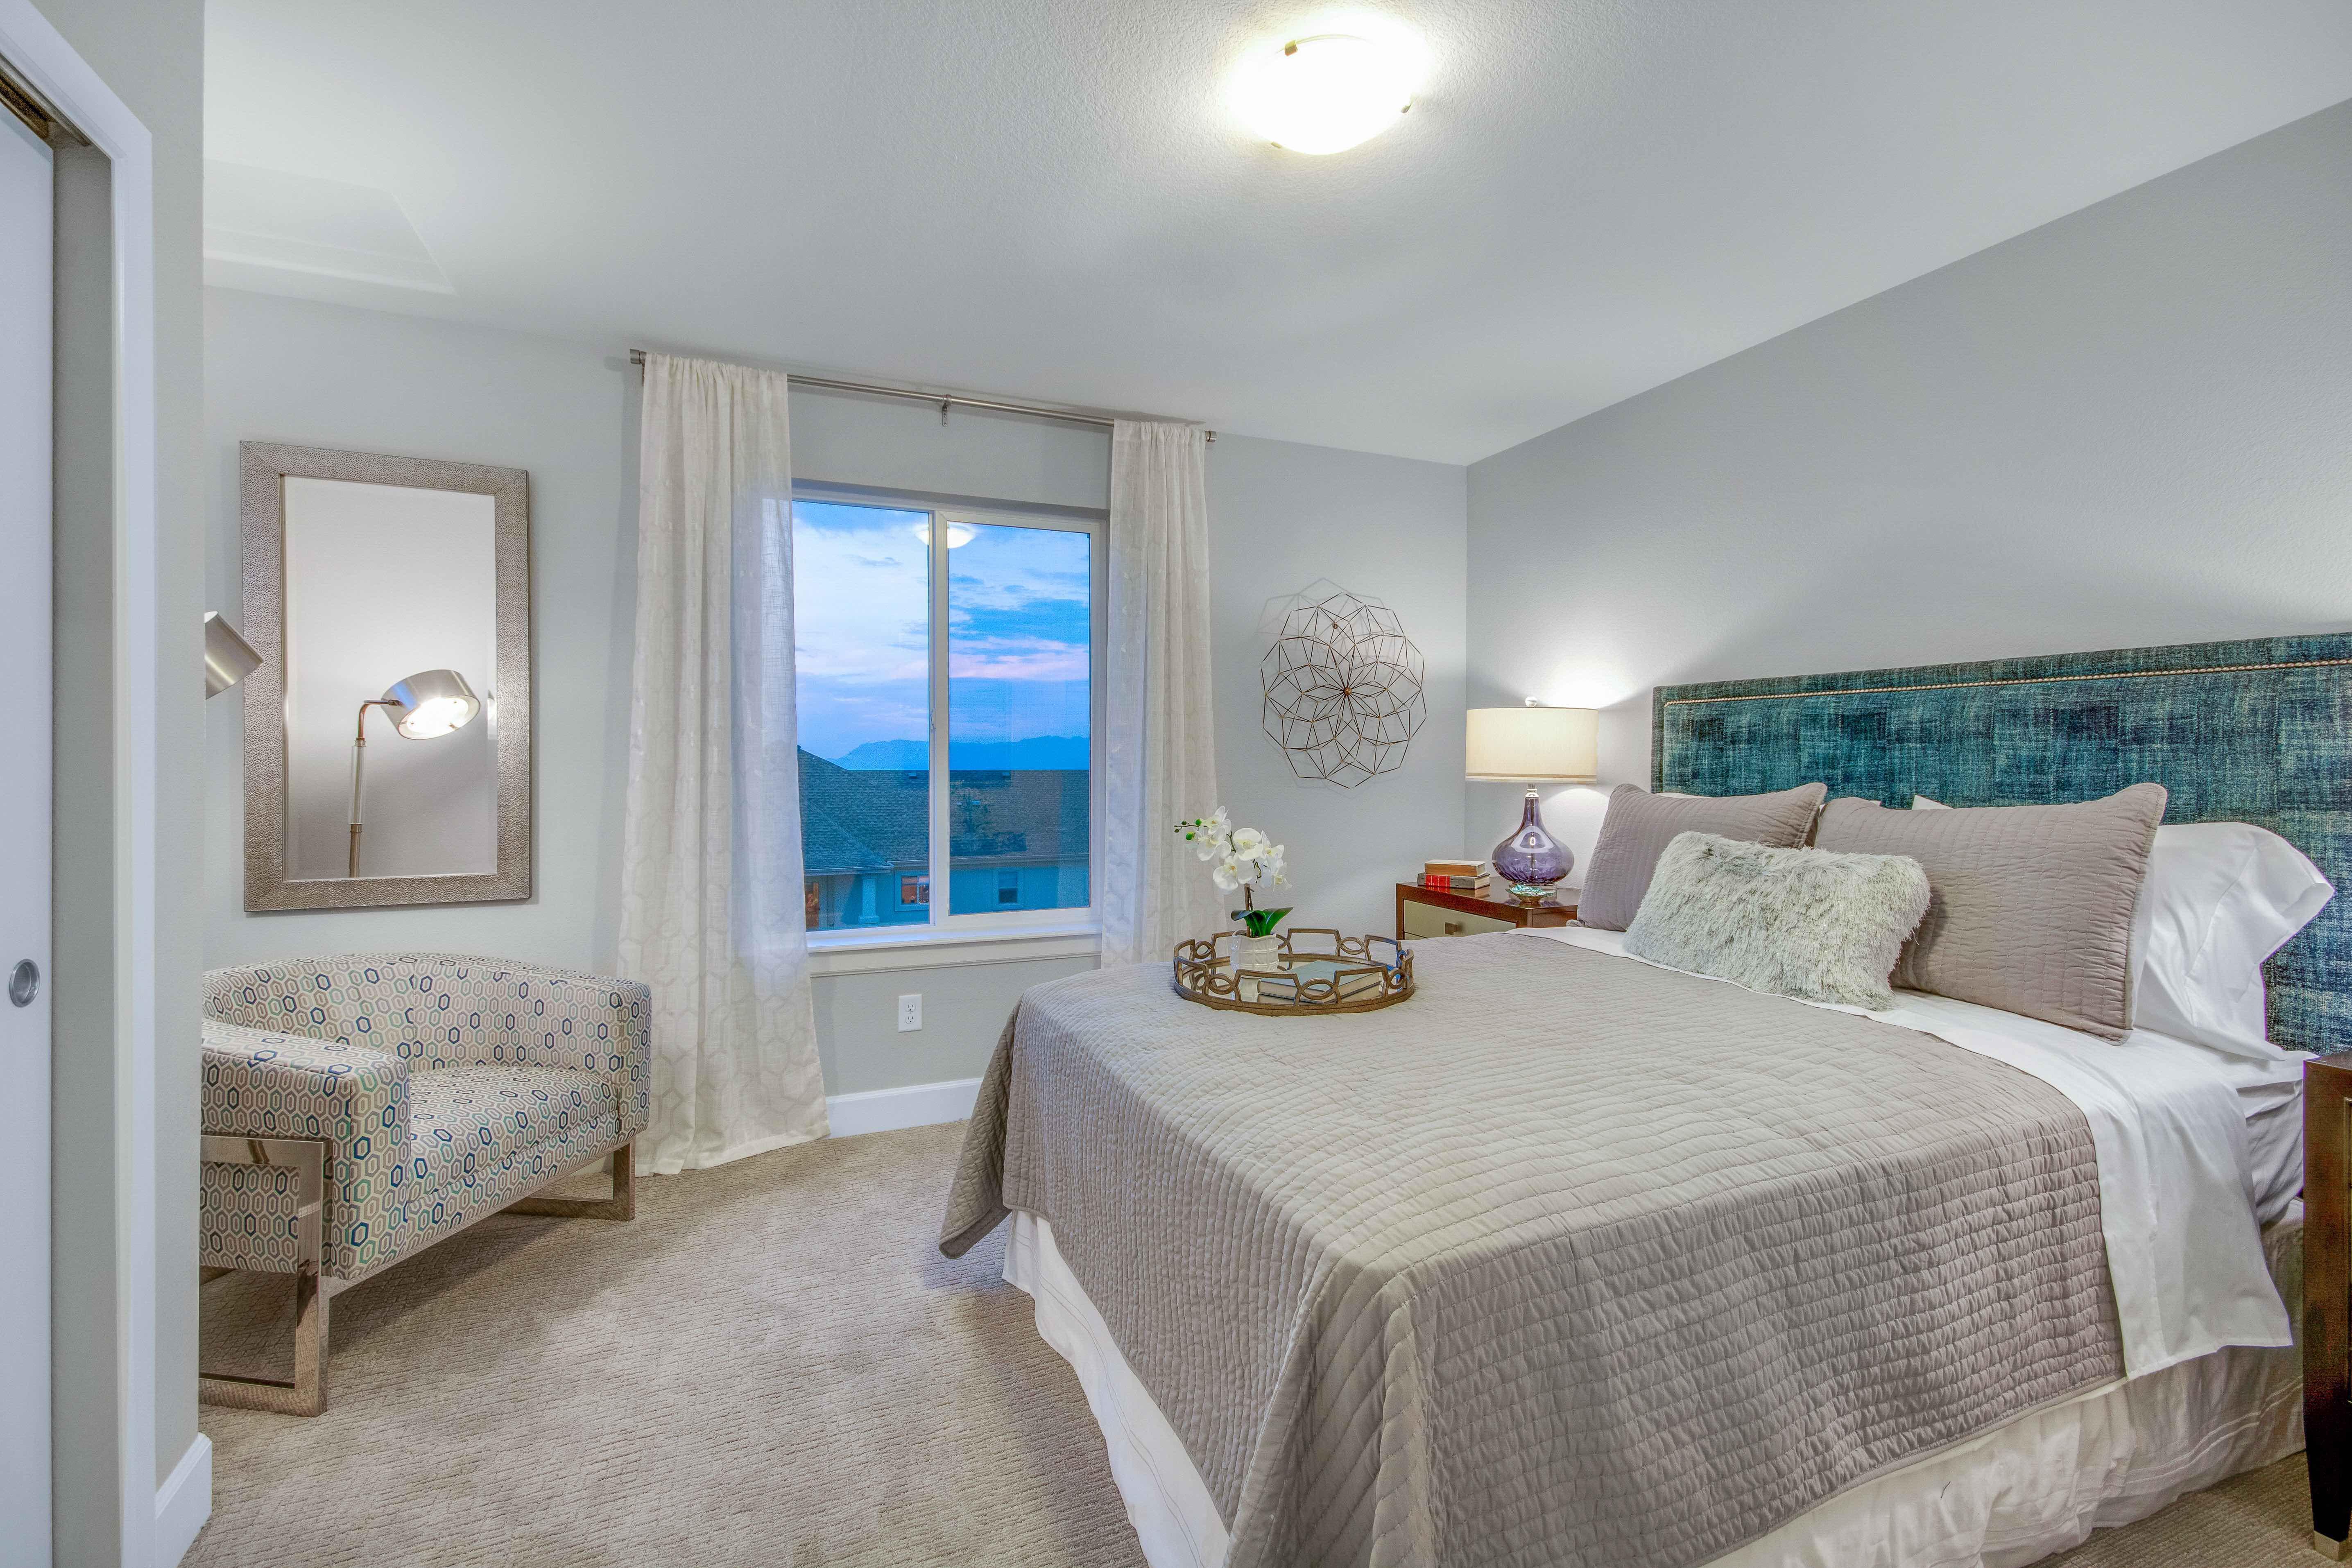 Bedroom featured in The Savannah By JM Weston Homes in Colorado Springs, CO